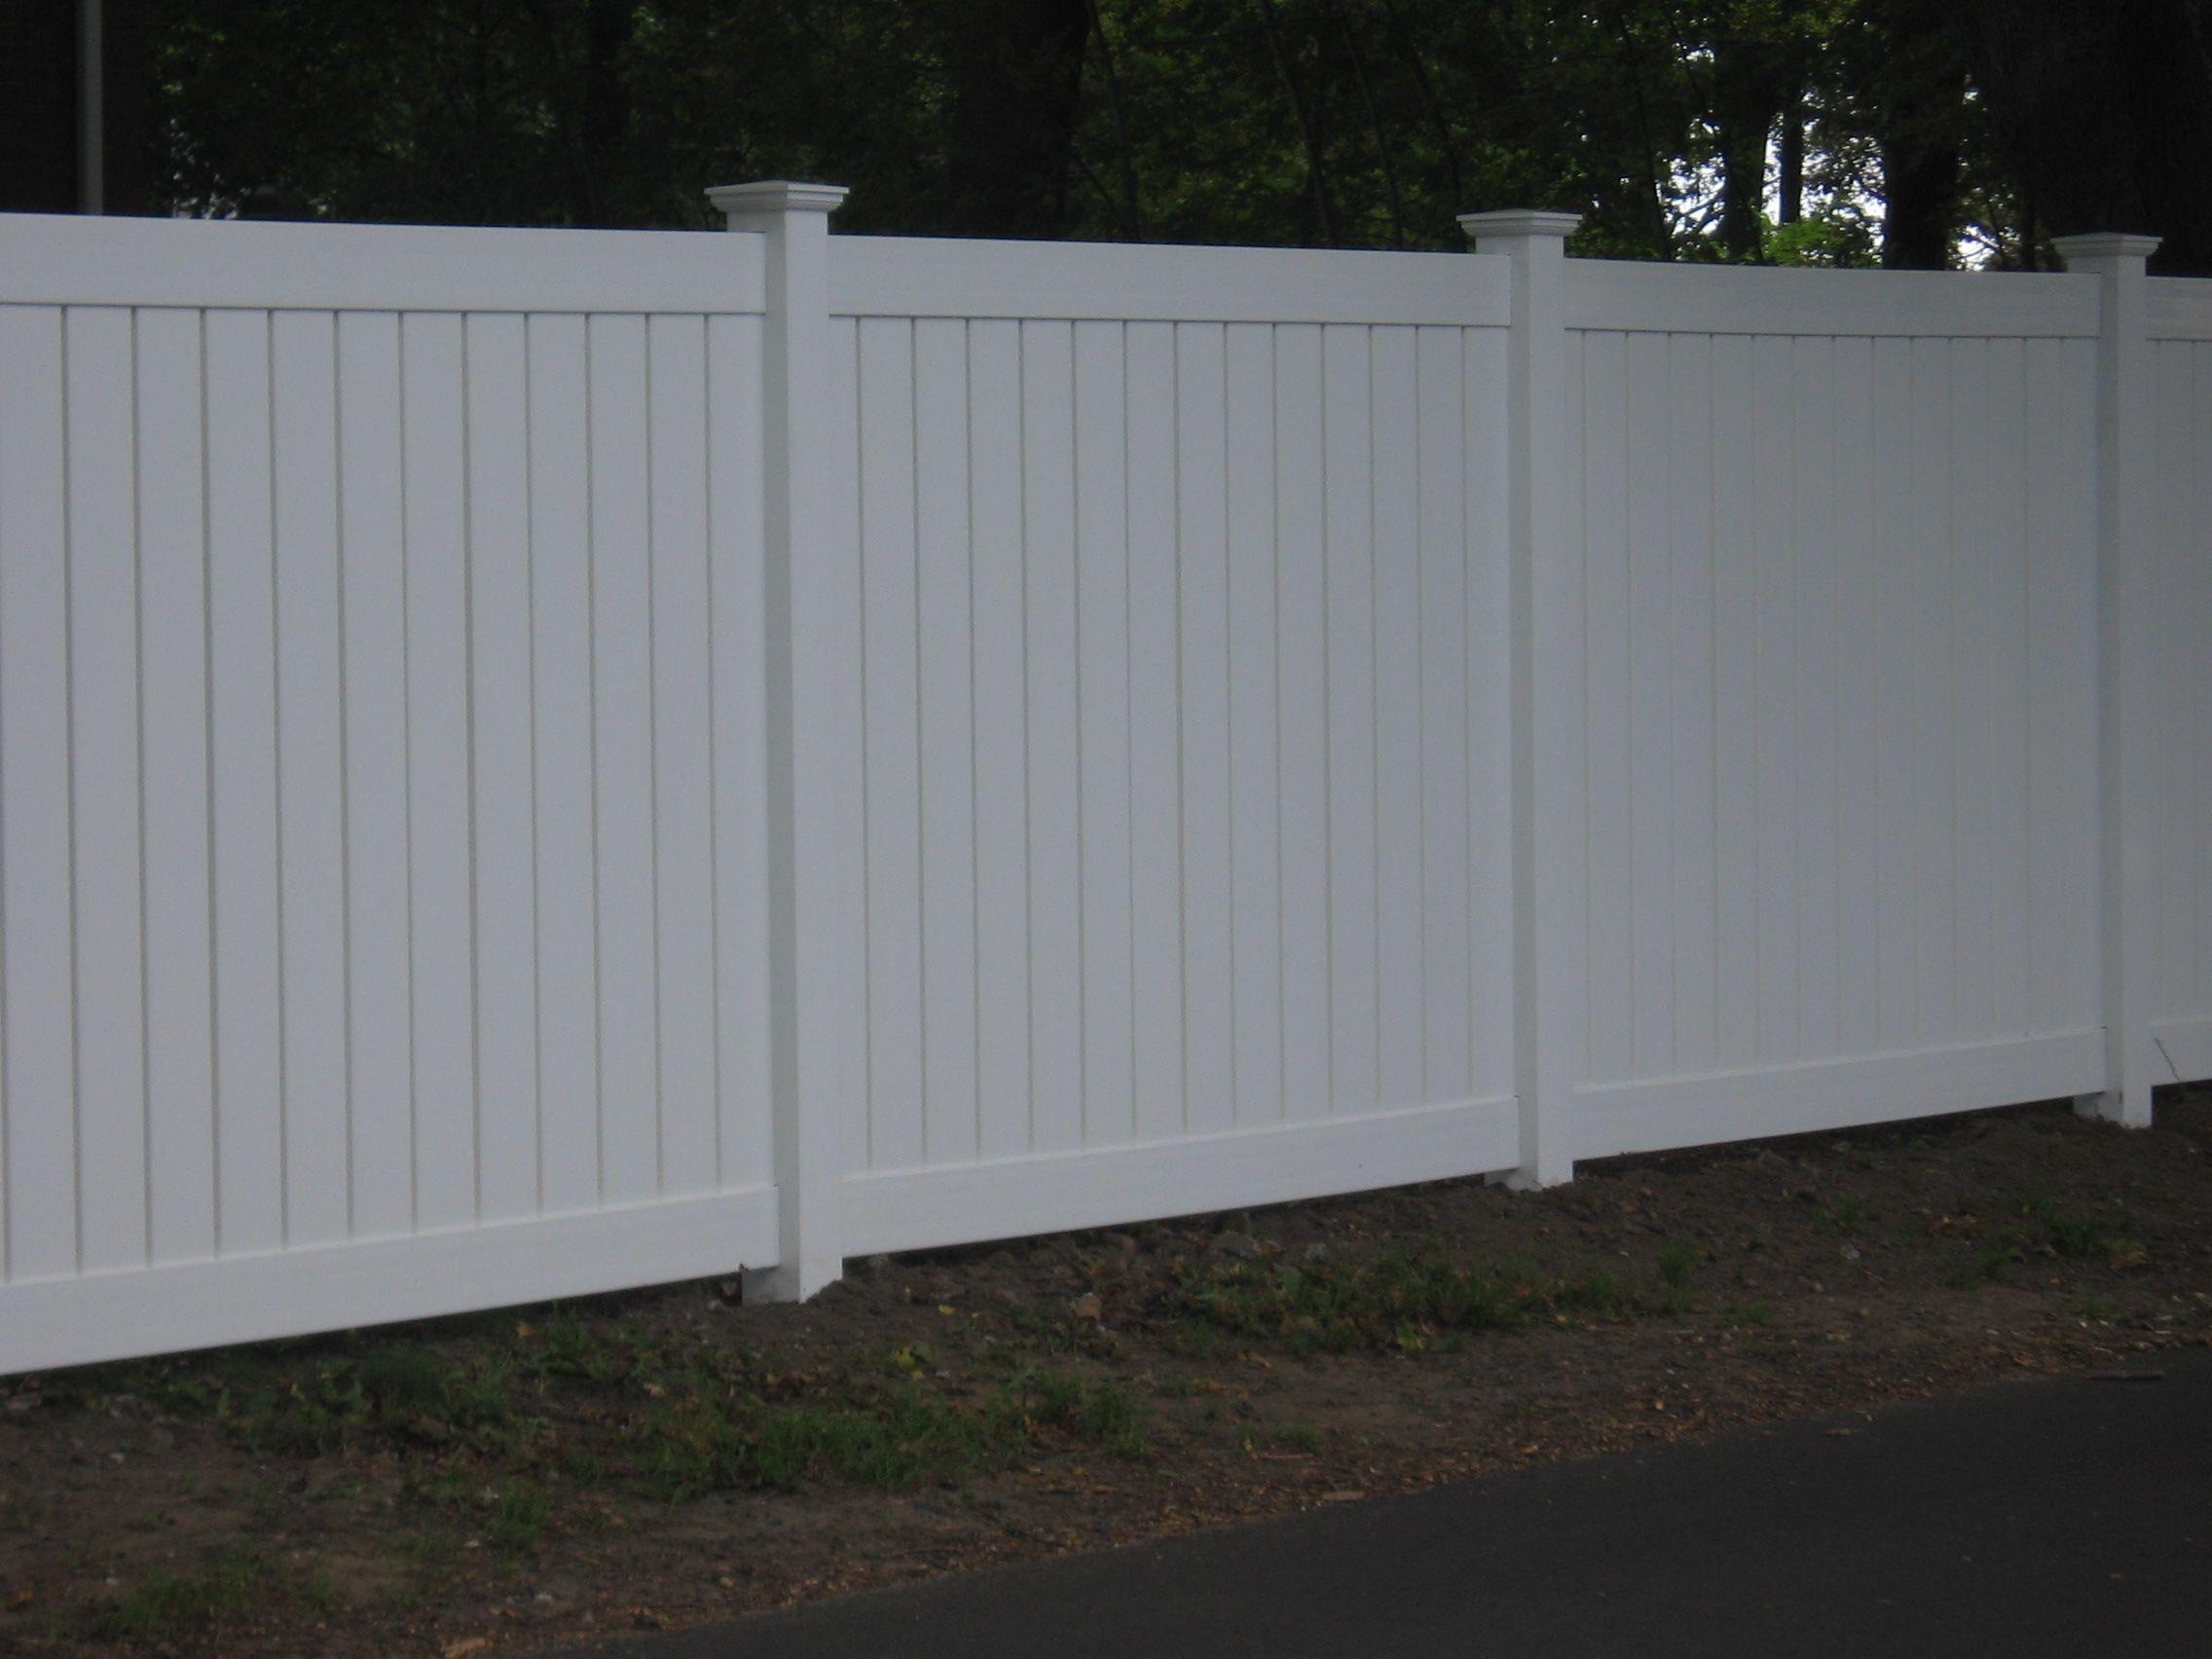 6 White Pvc Privacy Fence Vinyl Fences Brick Fence